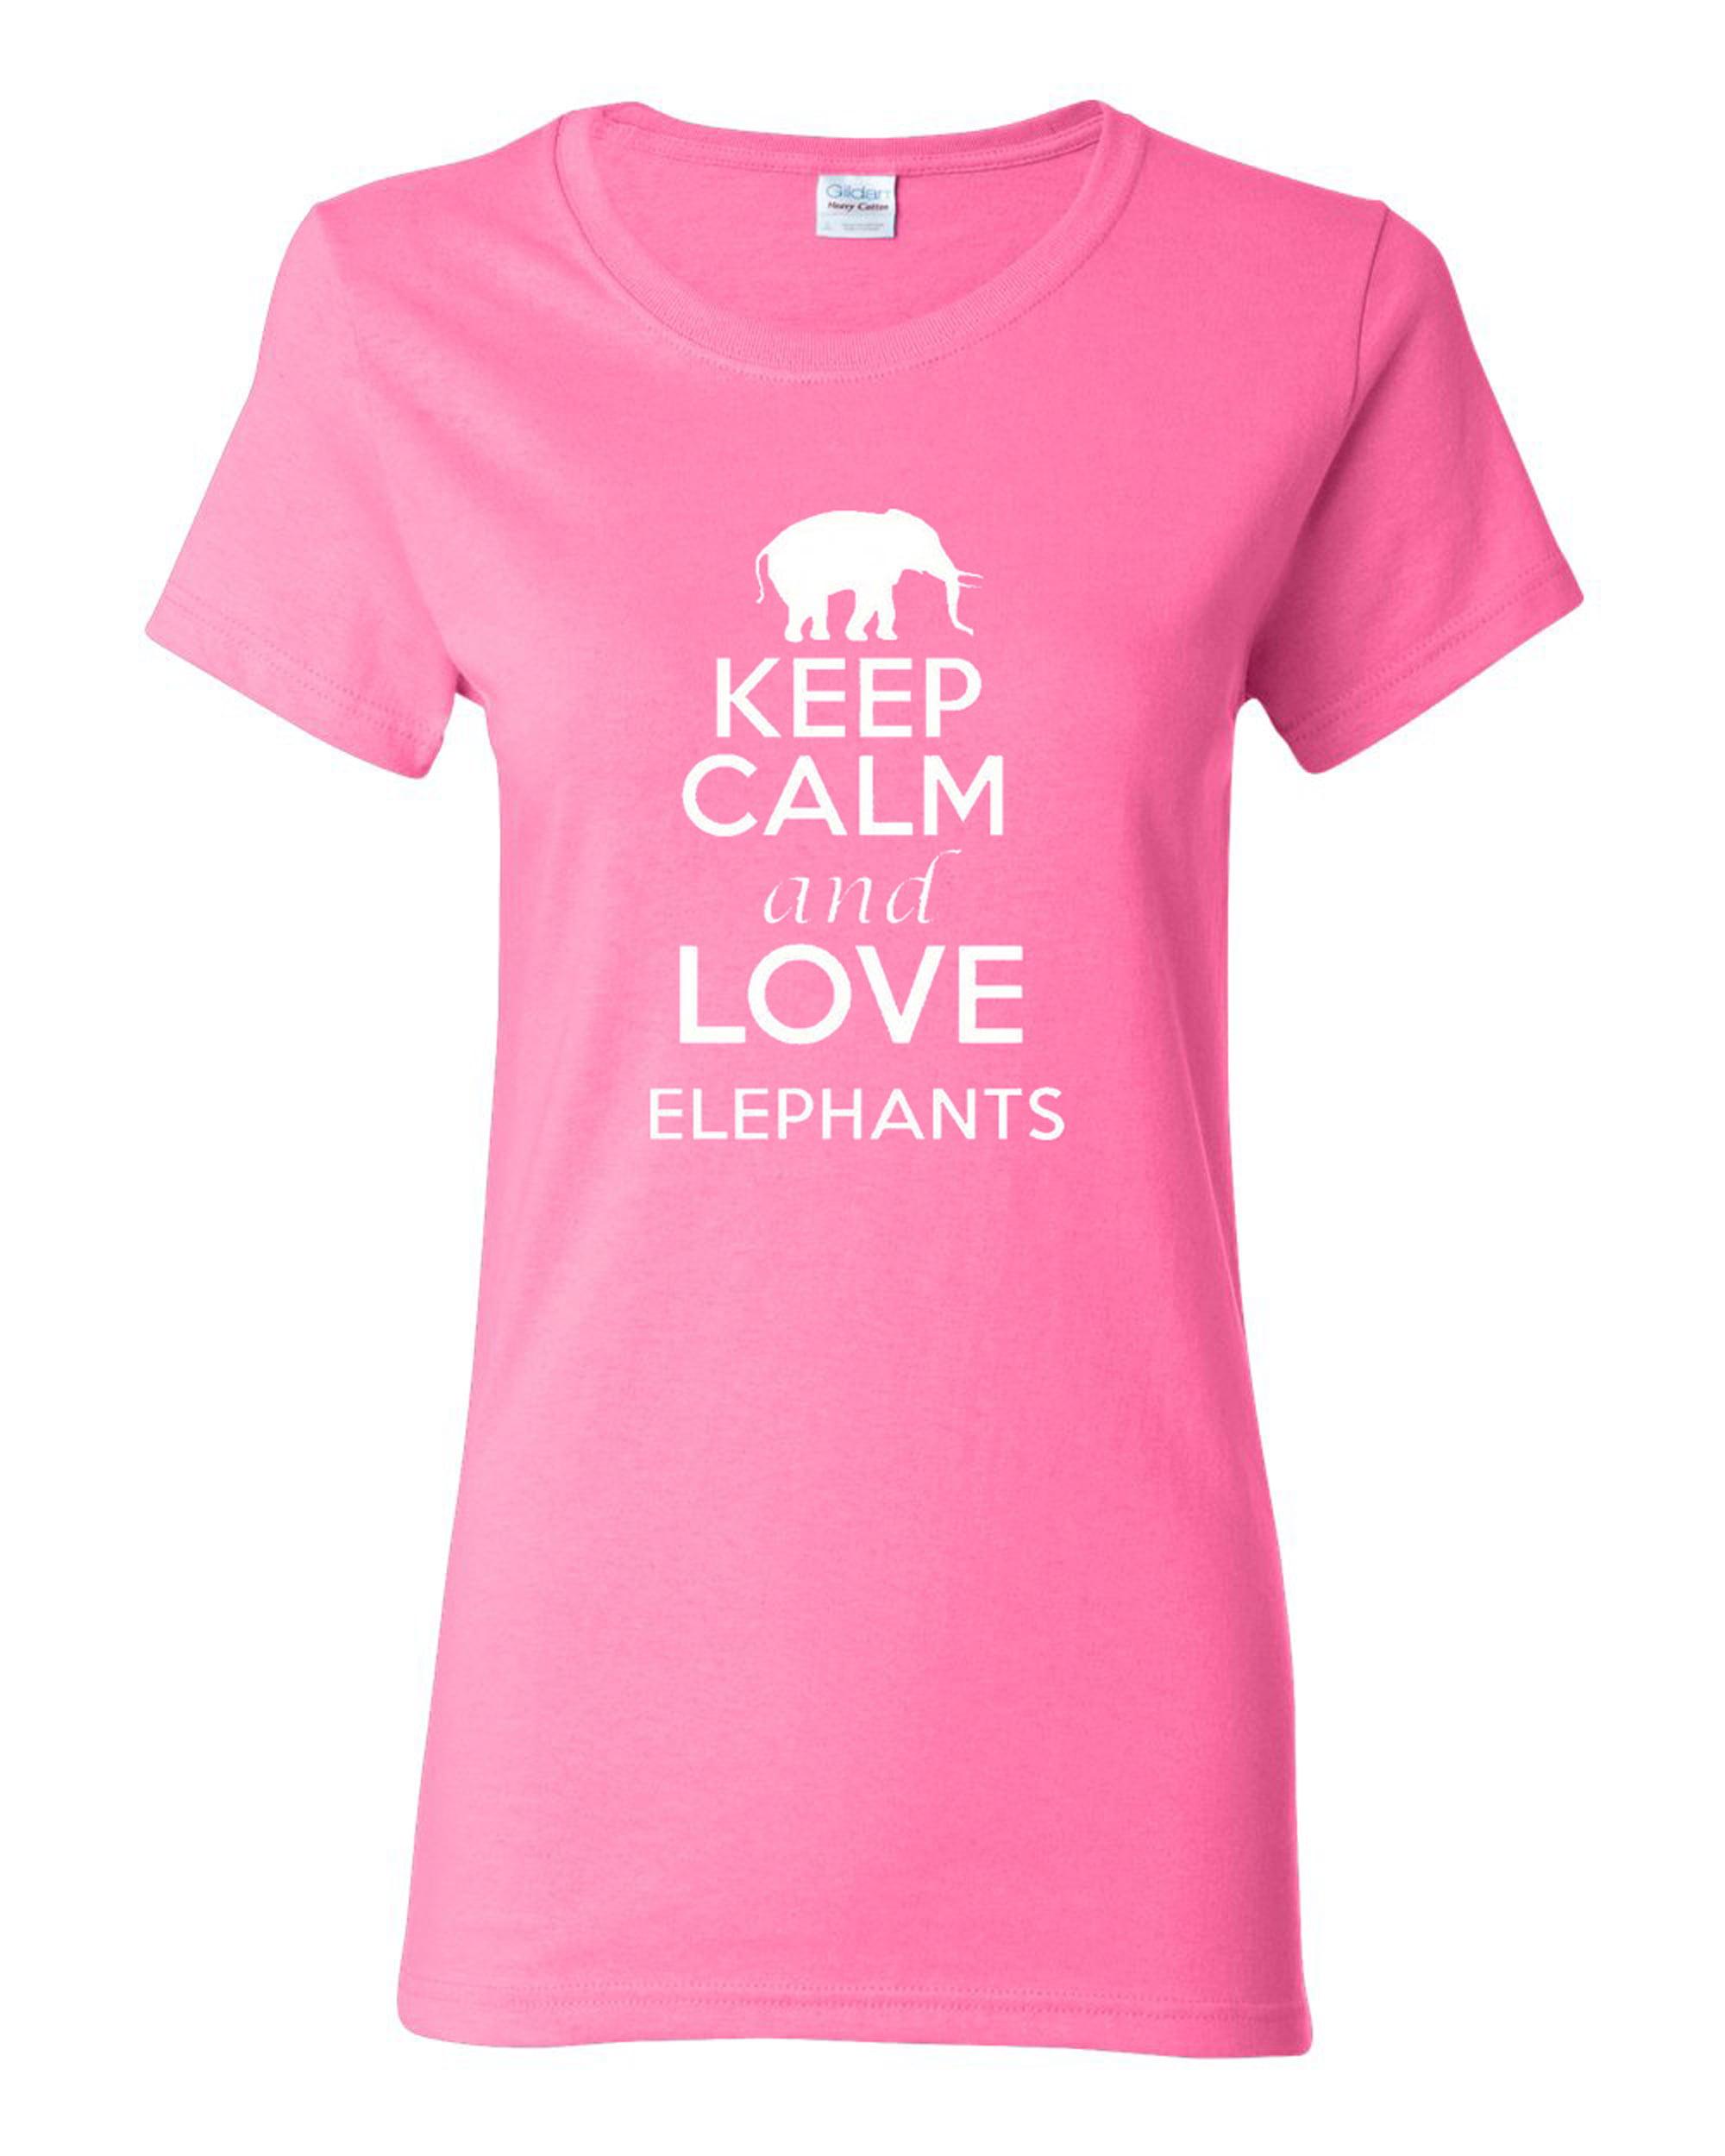 Ladies Keep Calm and Love Elephants T-Shirt Tee